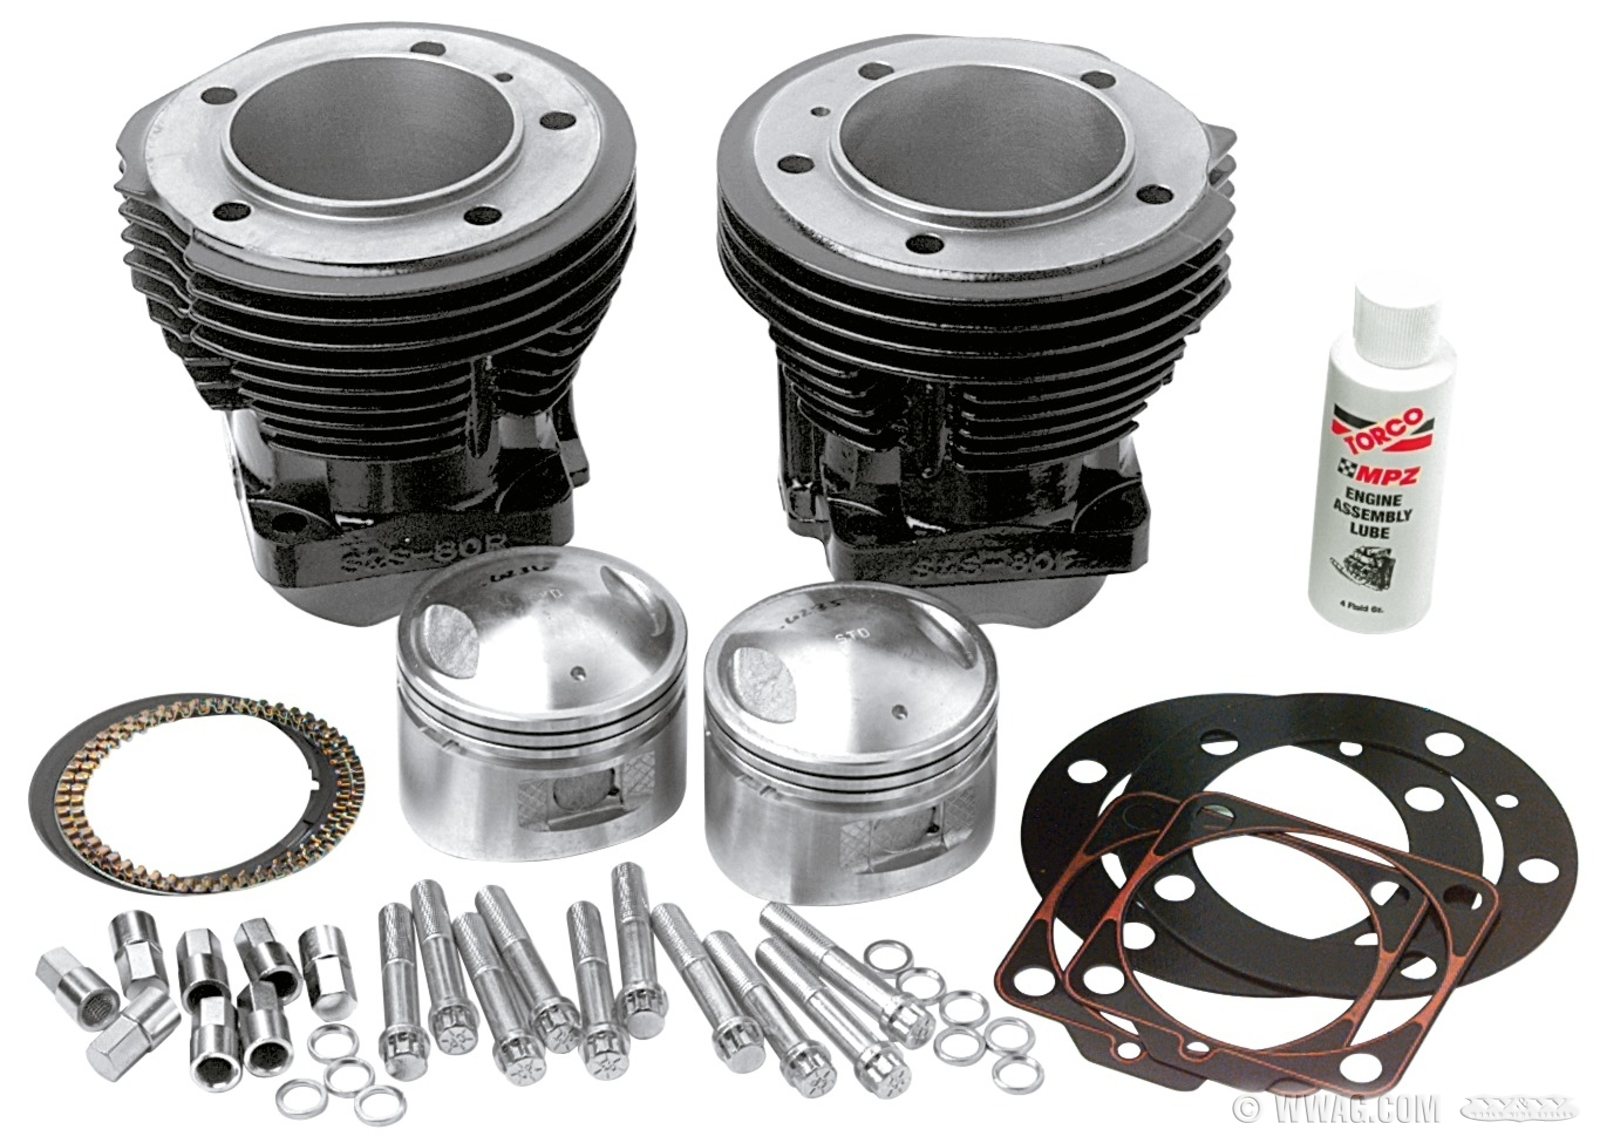 "W&W Cycles - Engine > S&S 3-5/8"" Big Bore Kits for Shovelhead"